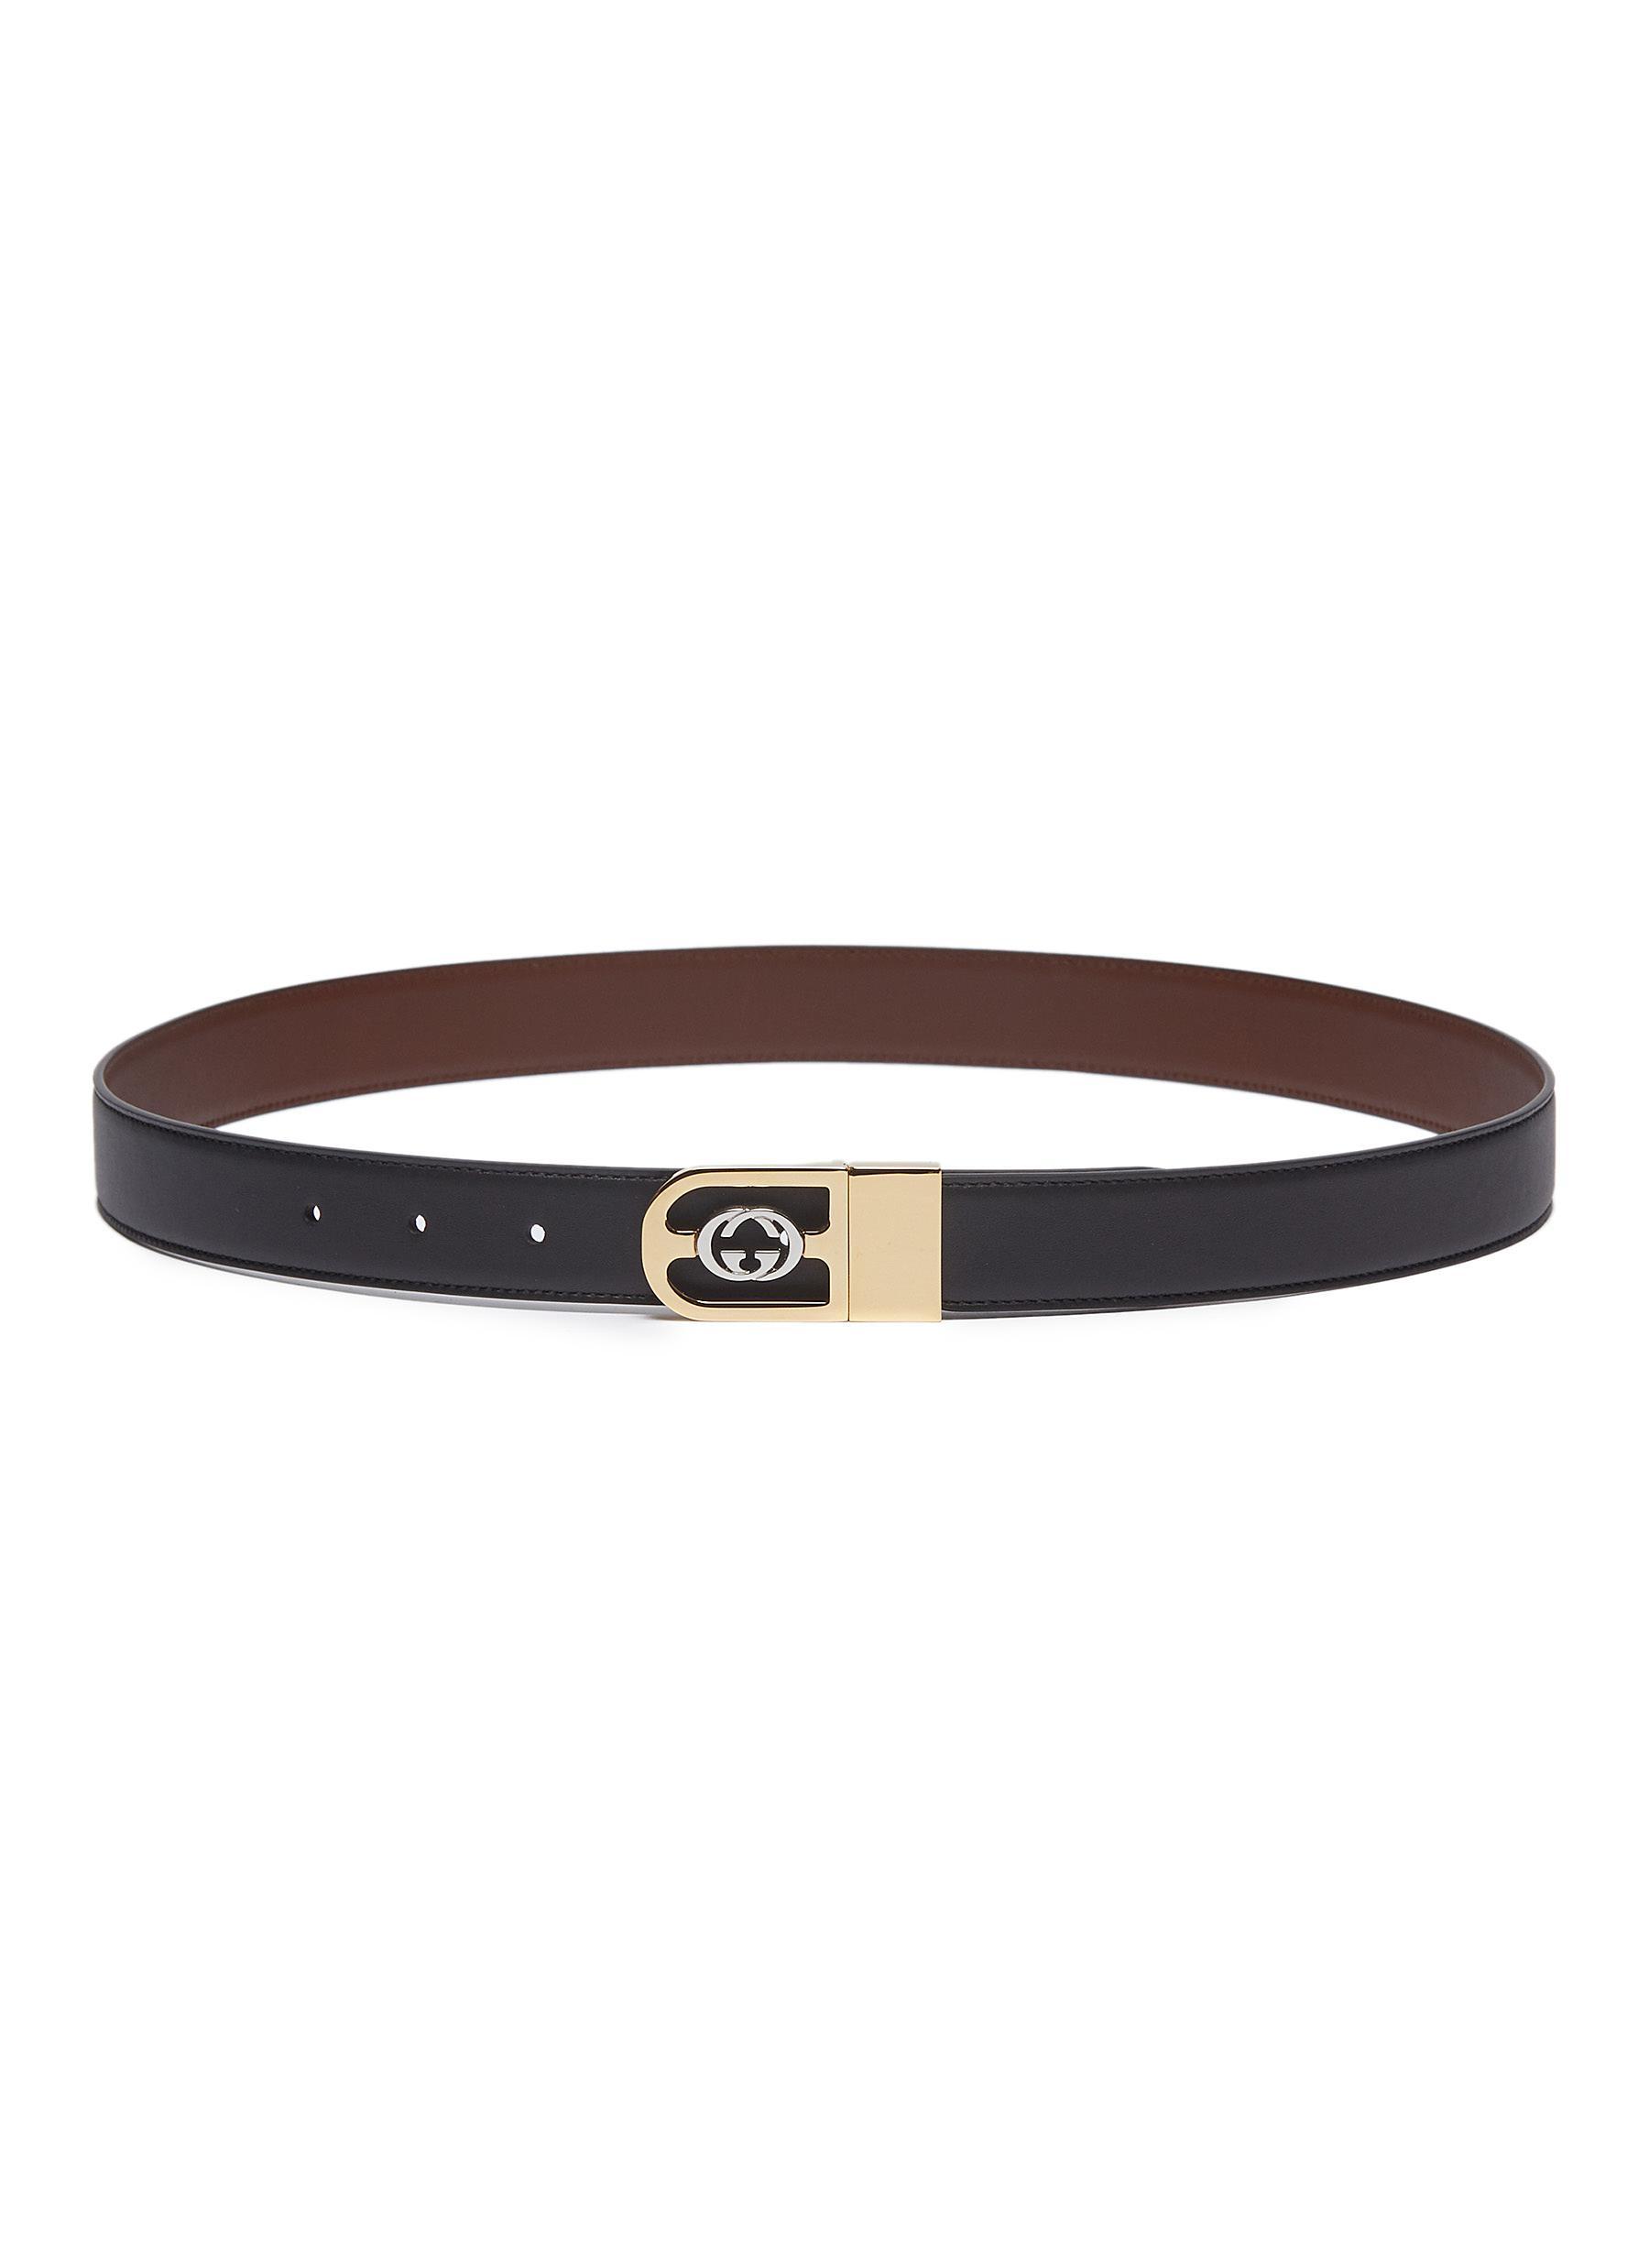 c816dd8f87d GUCCI   Reversible GG logo buckle leather belt   Men   Lane Crawford